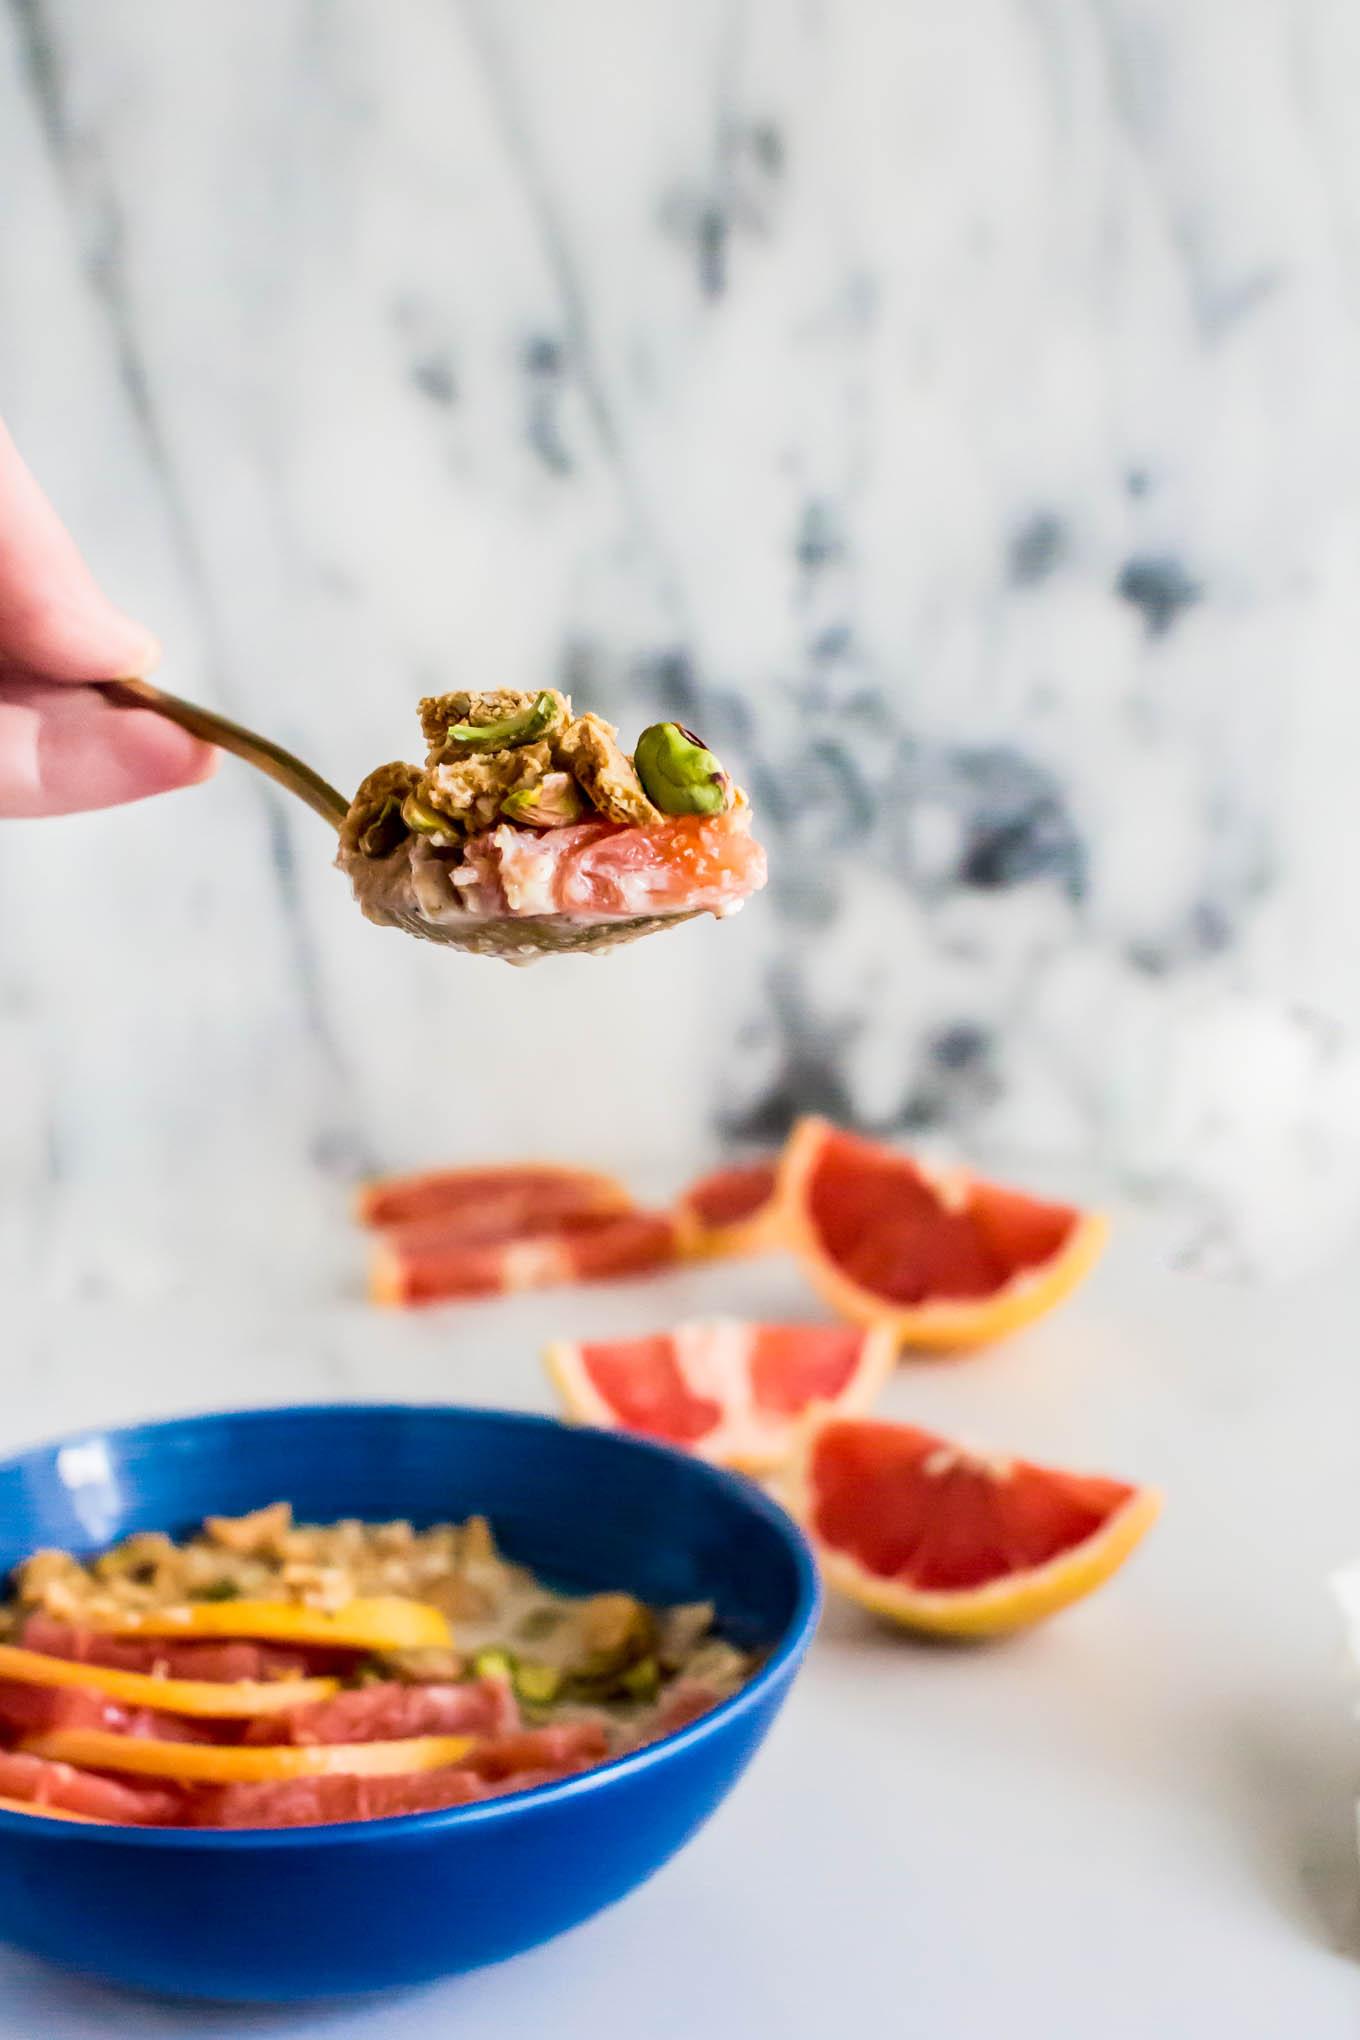 graham cracker muesli with grapefruit slices | immaEATthat.com